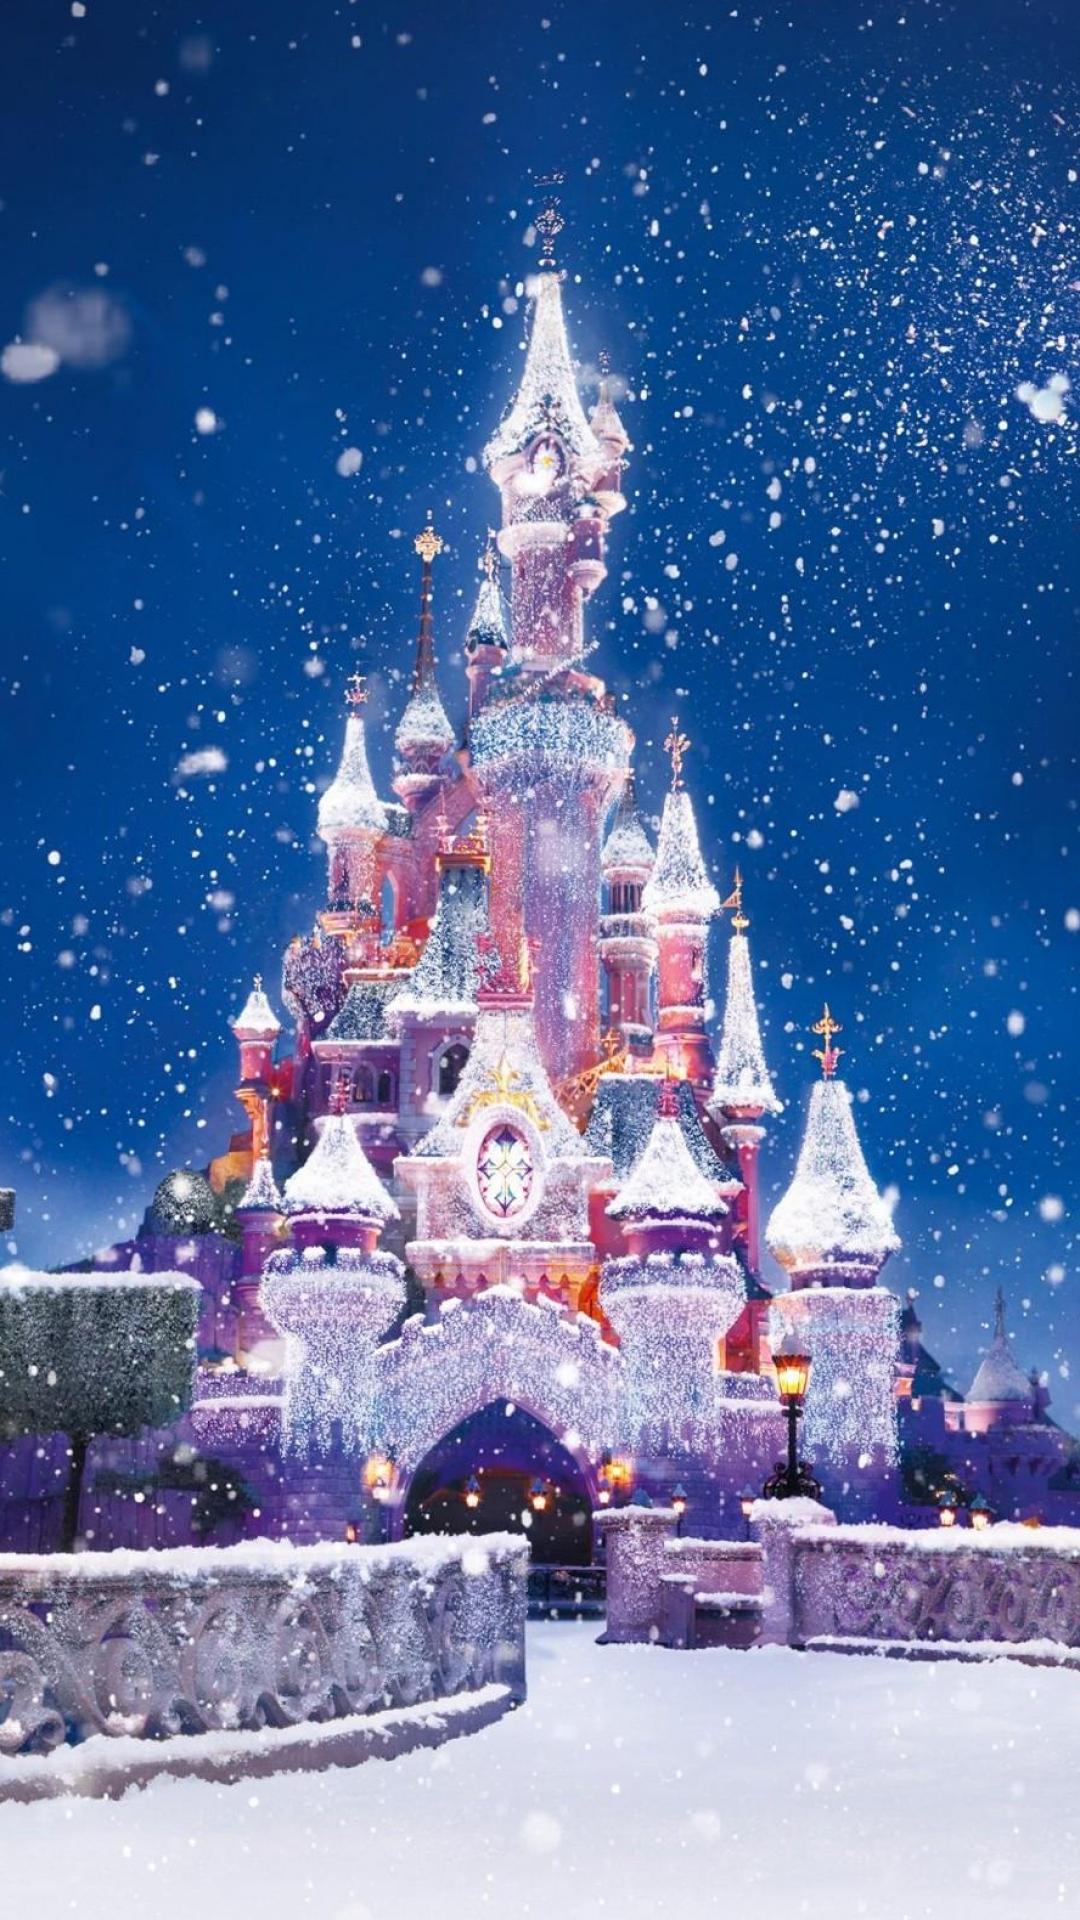 Disney Christmas Wallpaper for iPad on ...